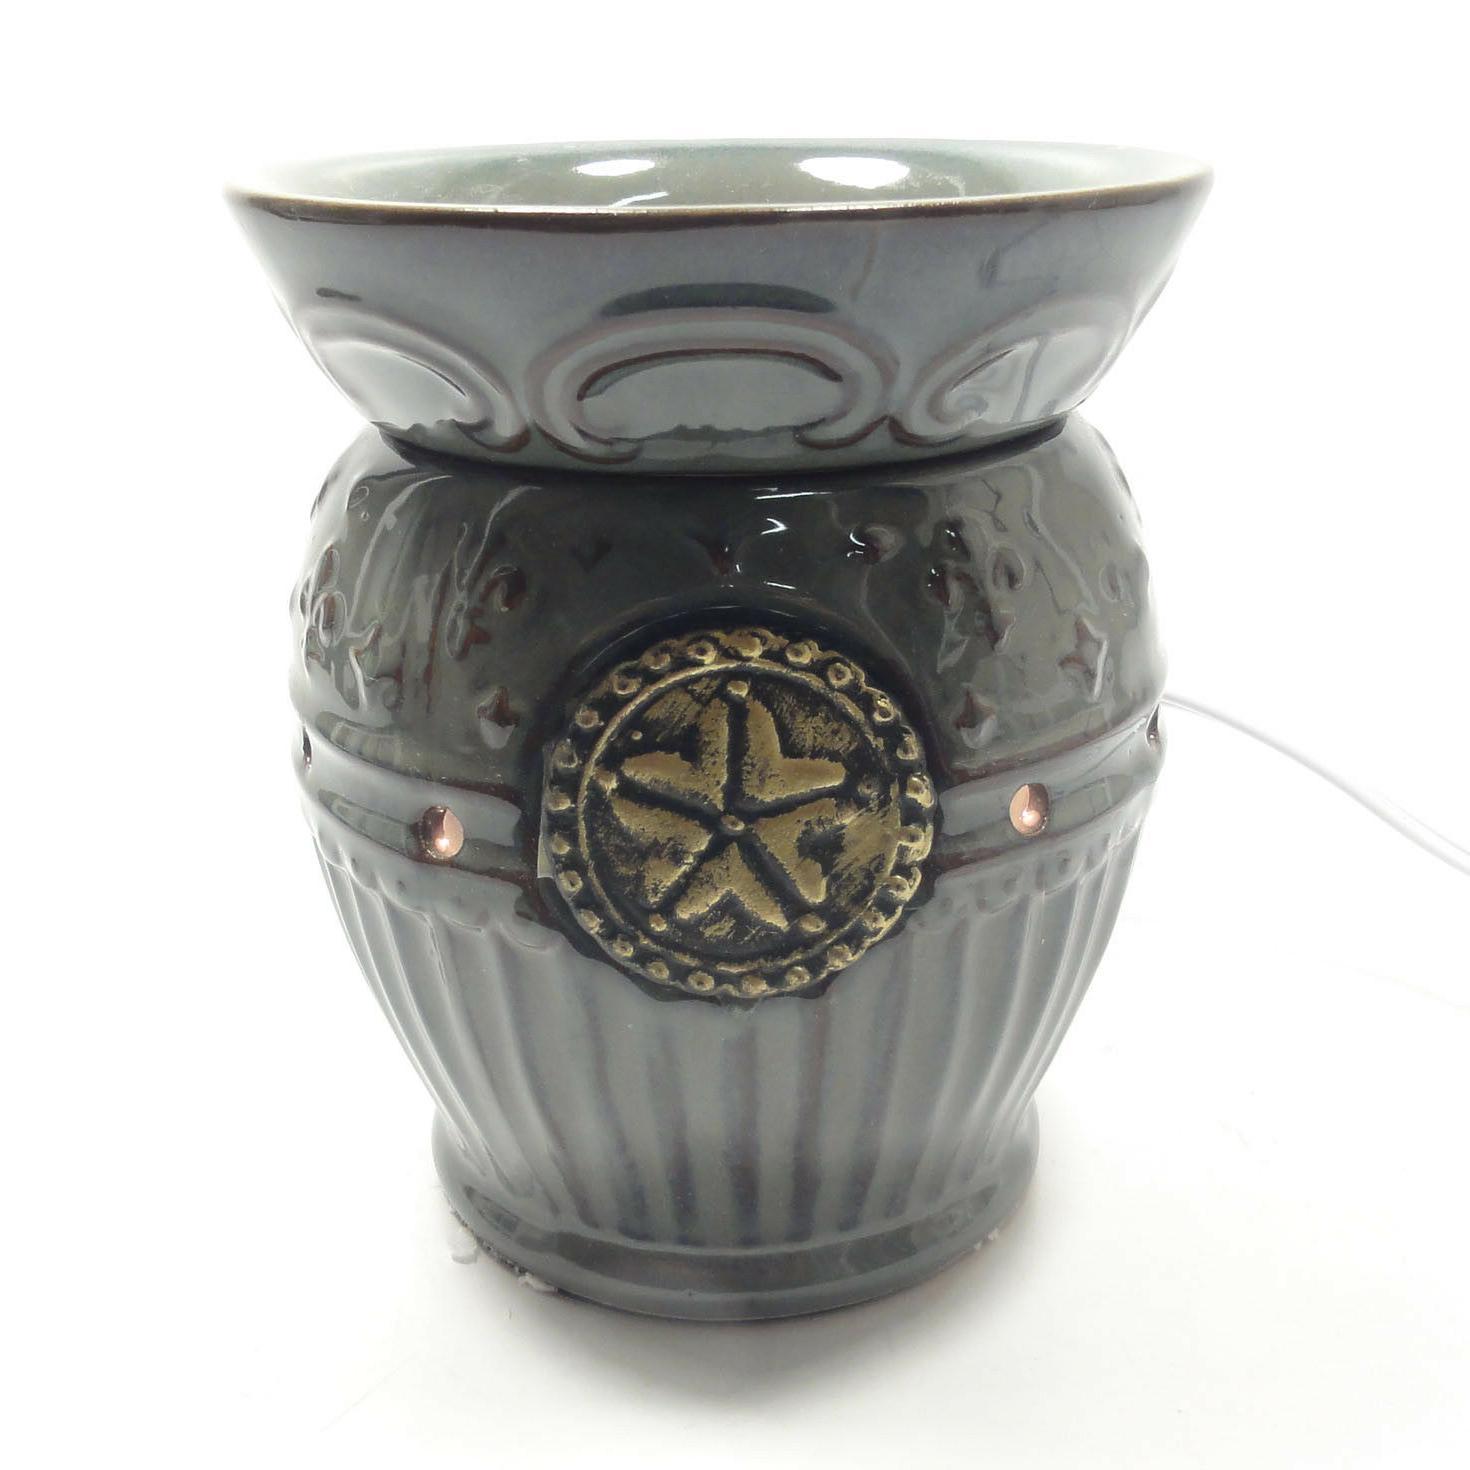 Classic Ceramic Electric Fragrance Oil Diffuser Aroma